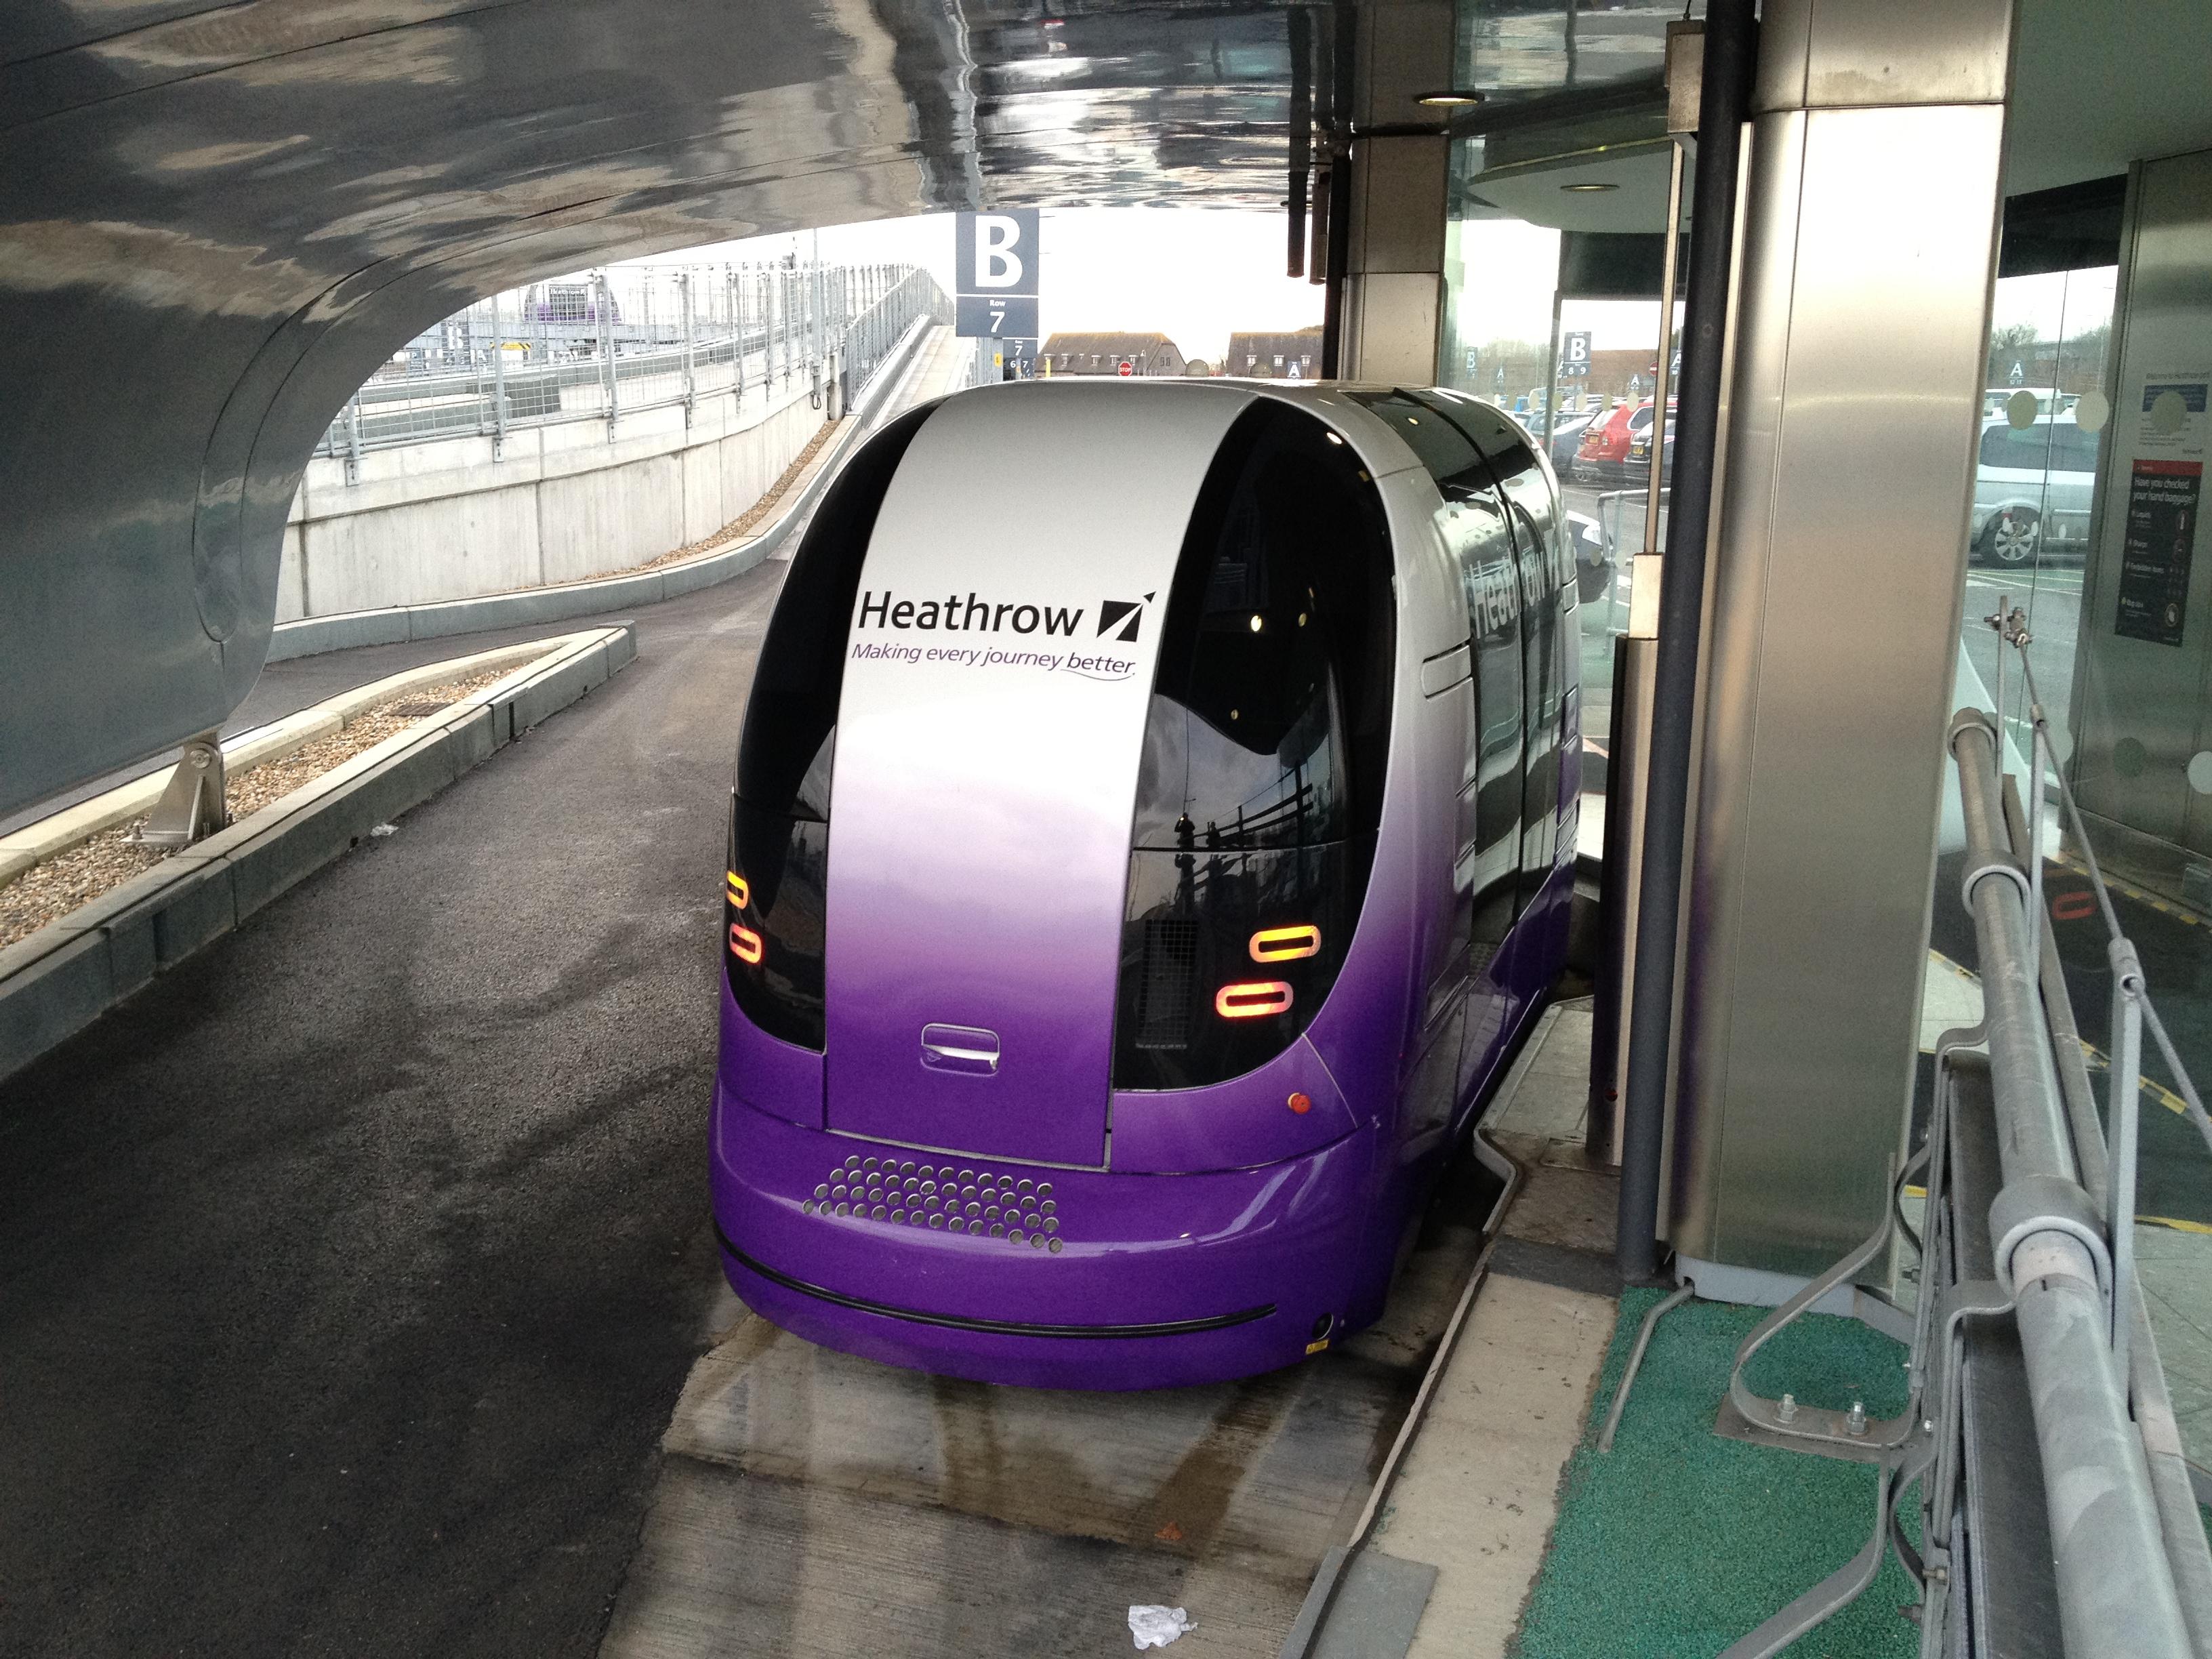 Driverless pod at Heathrow airport